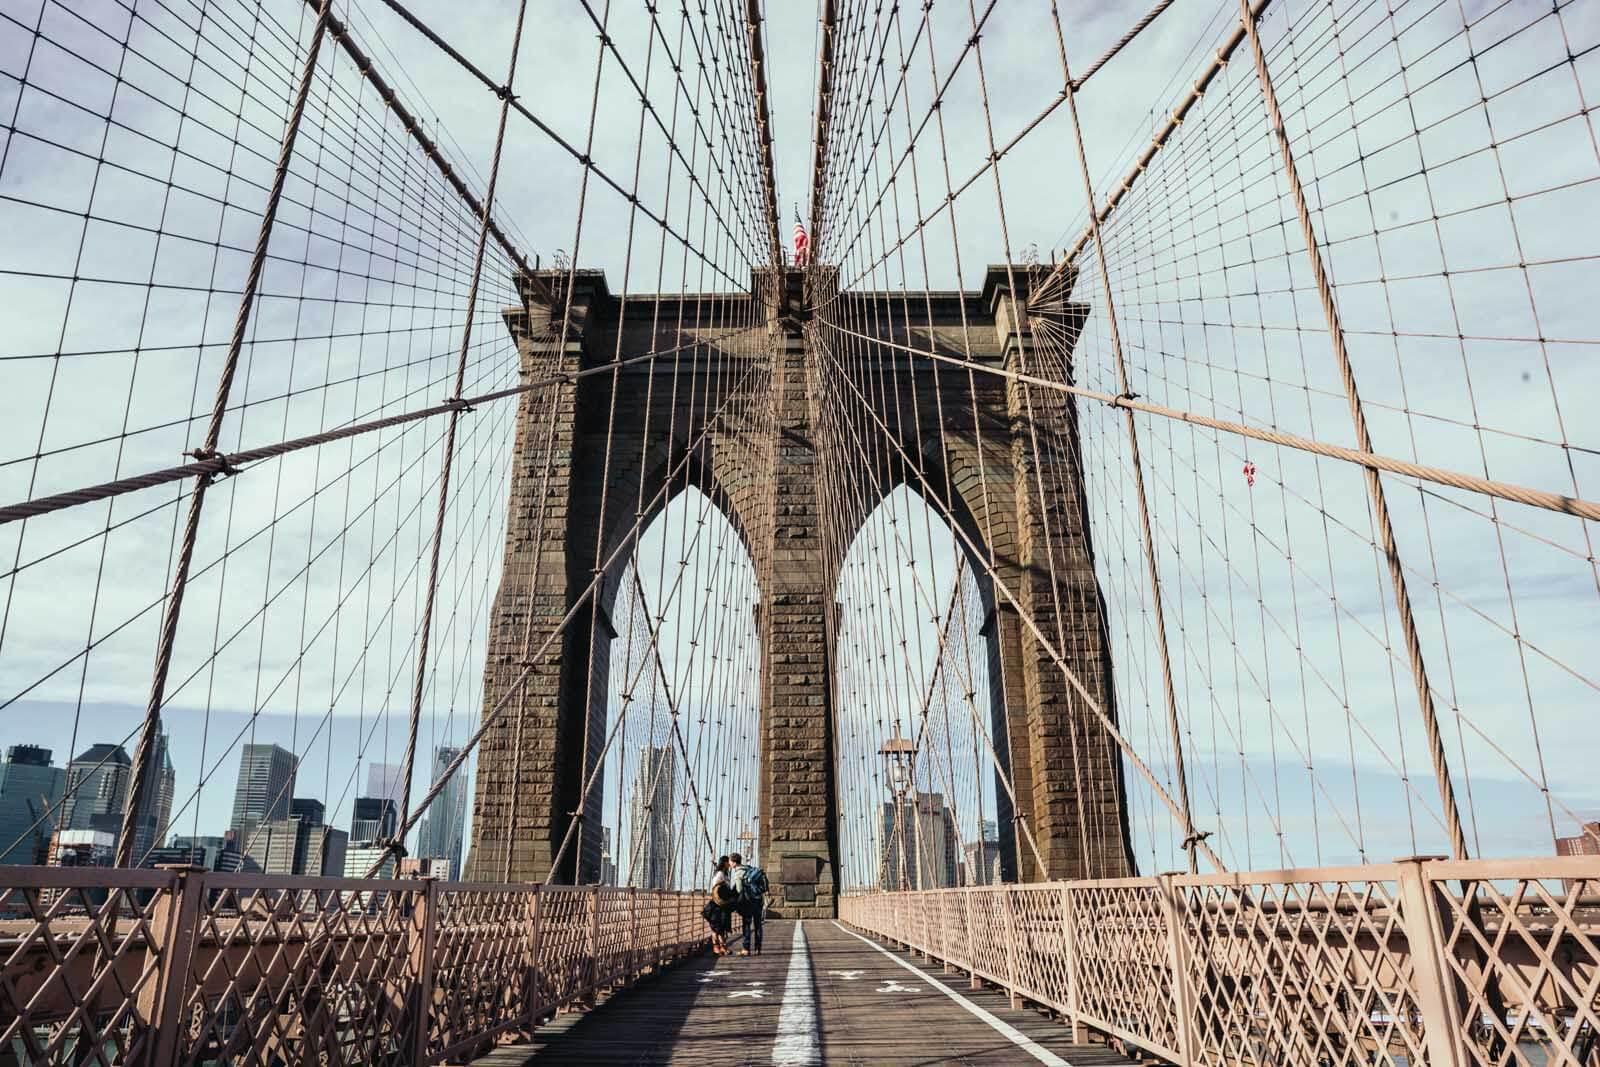 a couples kiss on the Brooklyn Bridge